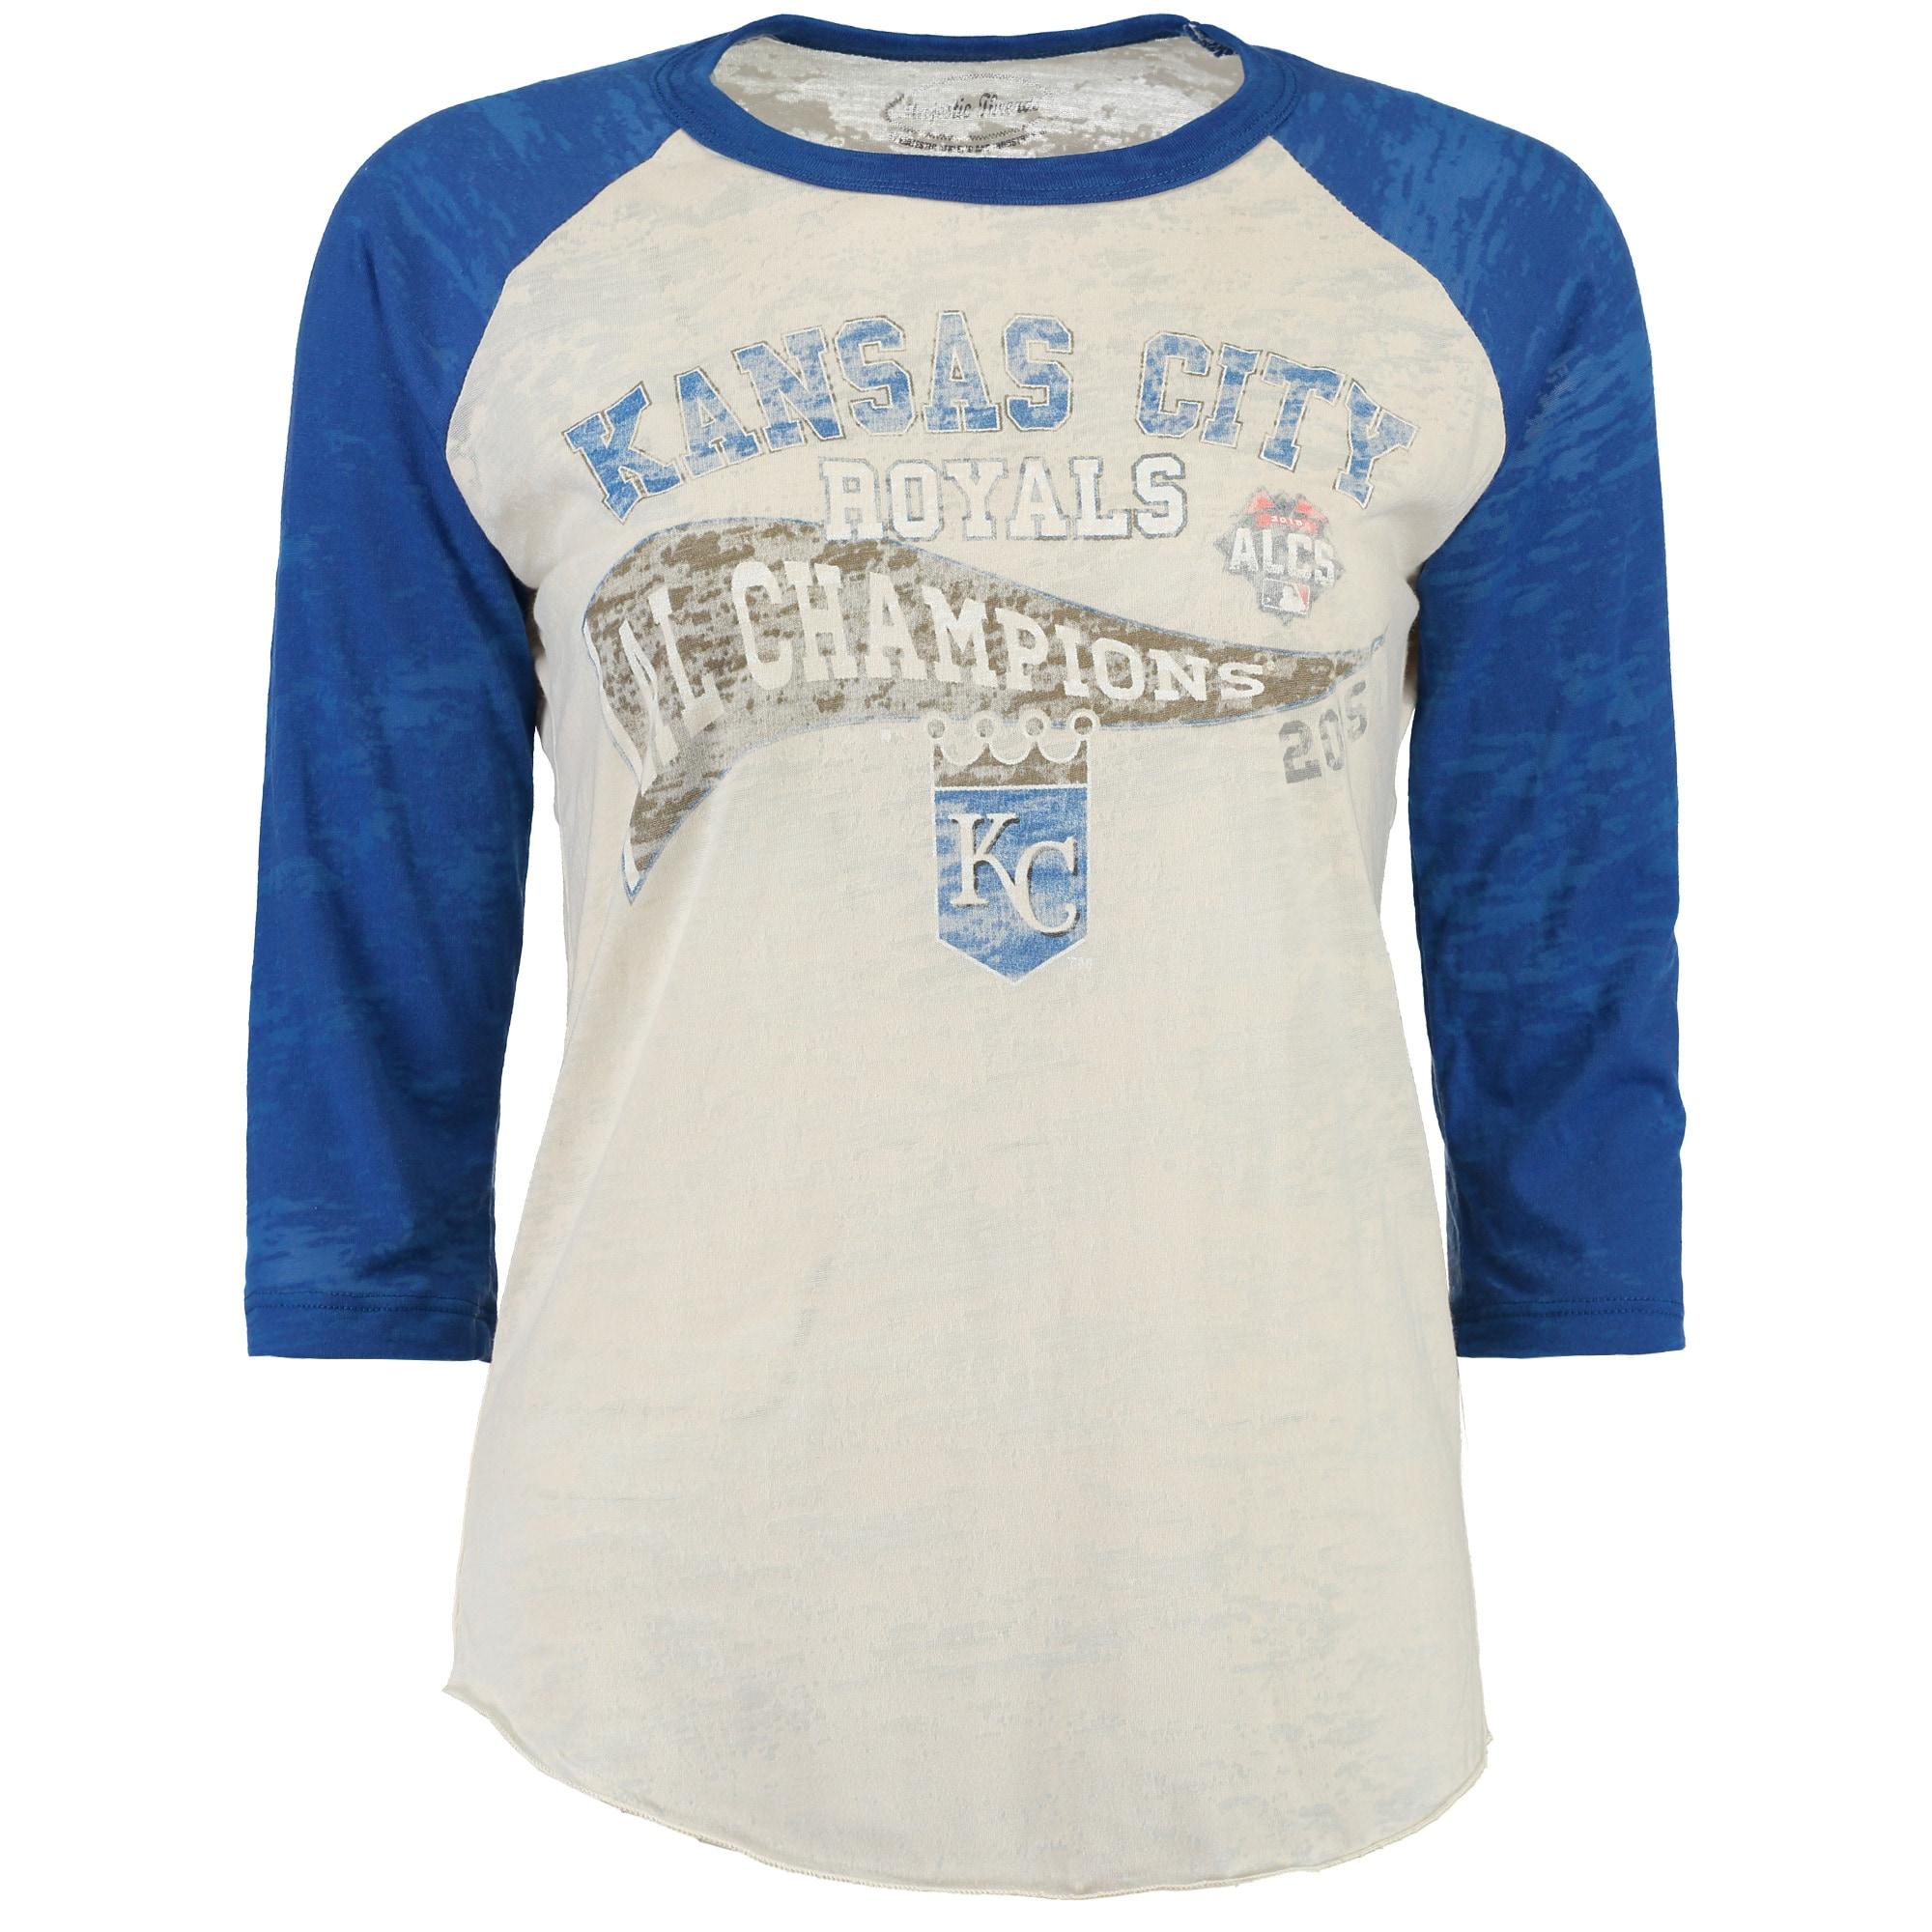 Kansas City Royals Majestic Threads Women's 2015 League Champions Three-Quarter Raglan Sleeve Tri-Blend T-Shirt - Cream/Royal